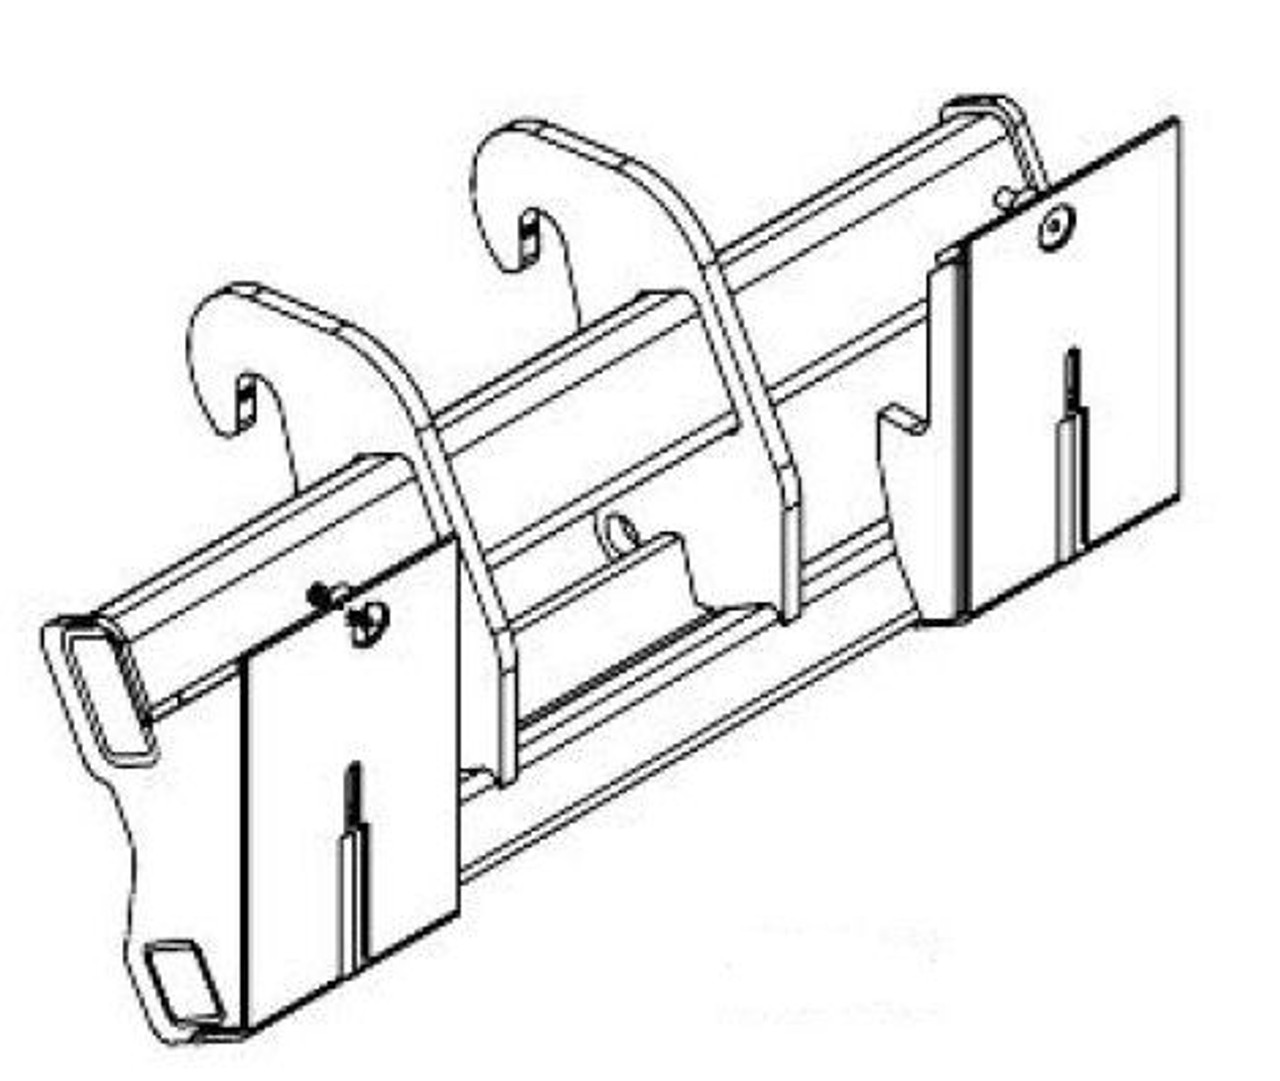 JCB 506 | 508 to Universal Skid Steer Mounting